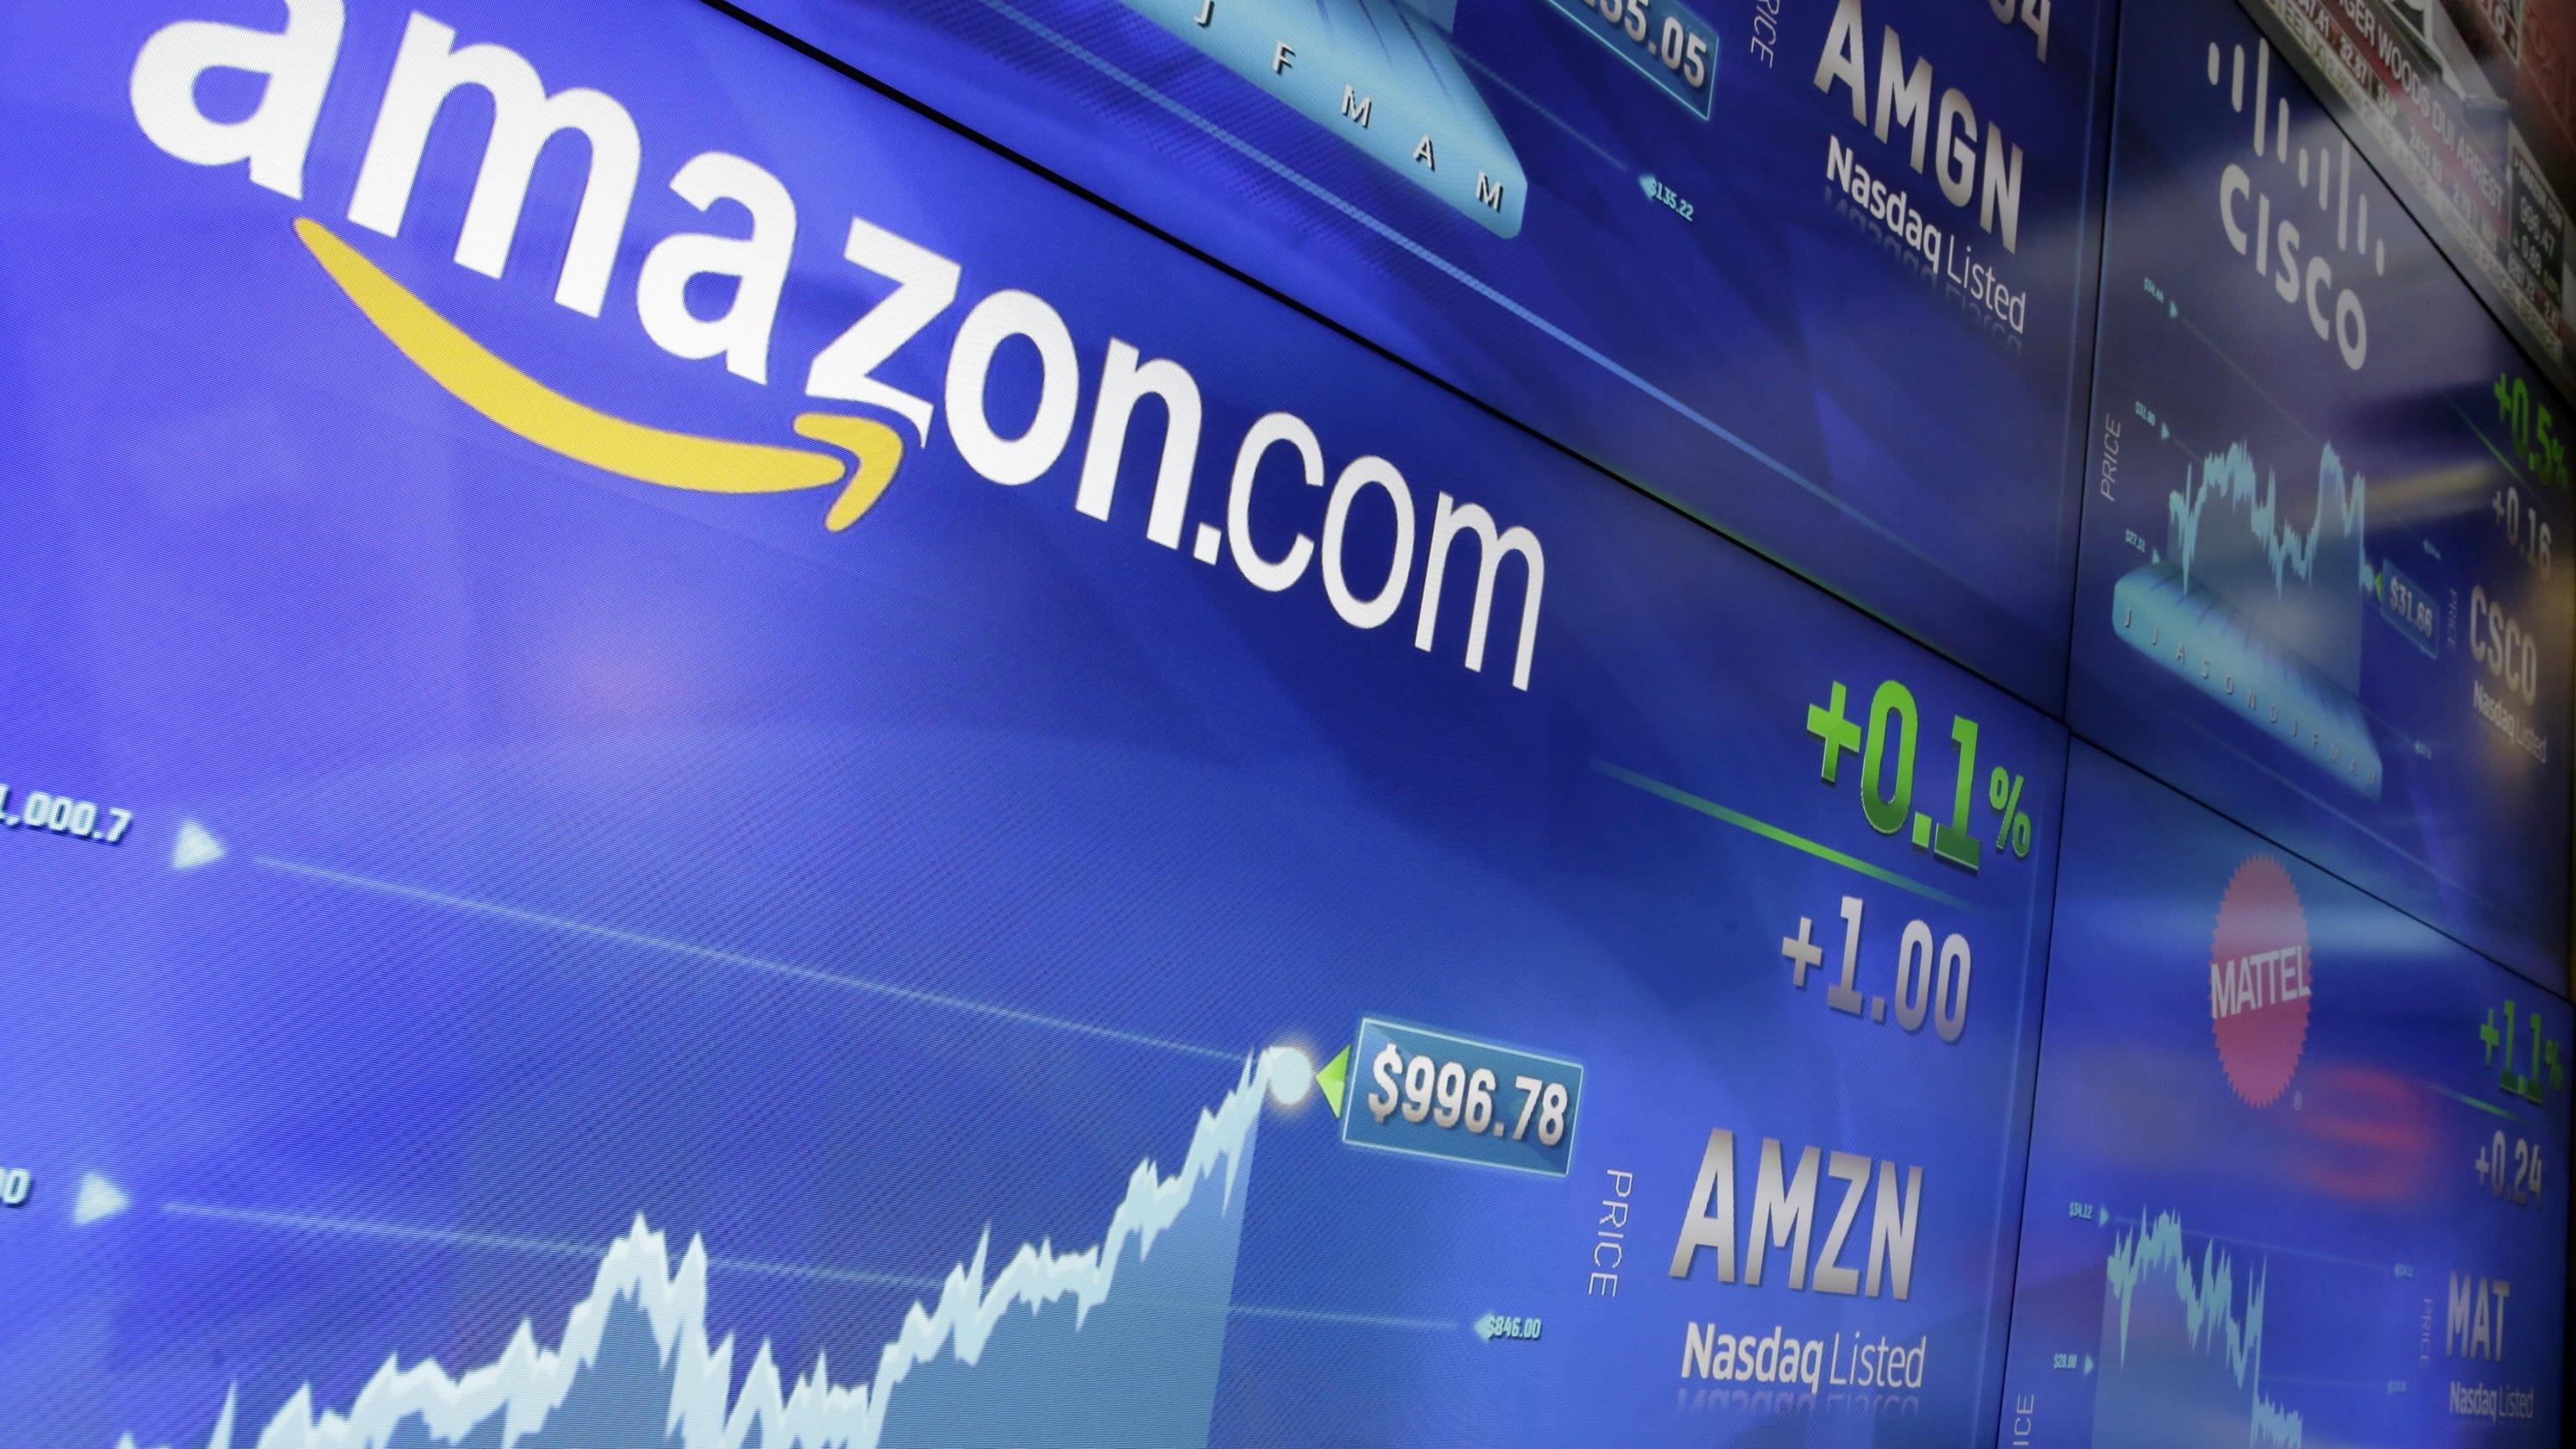 b01c56fd437f dallasnews.com Amazon offers Prime discount to those on gov t benefits